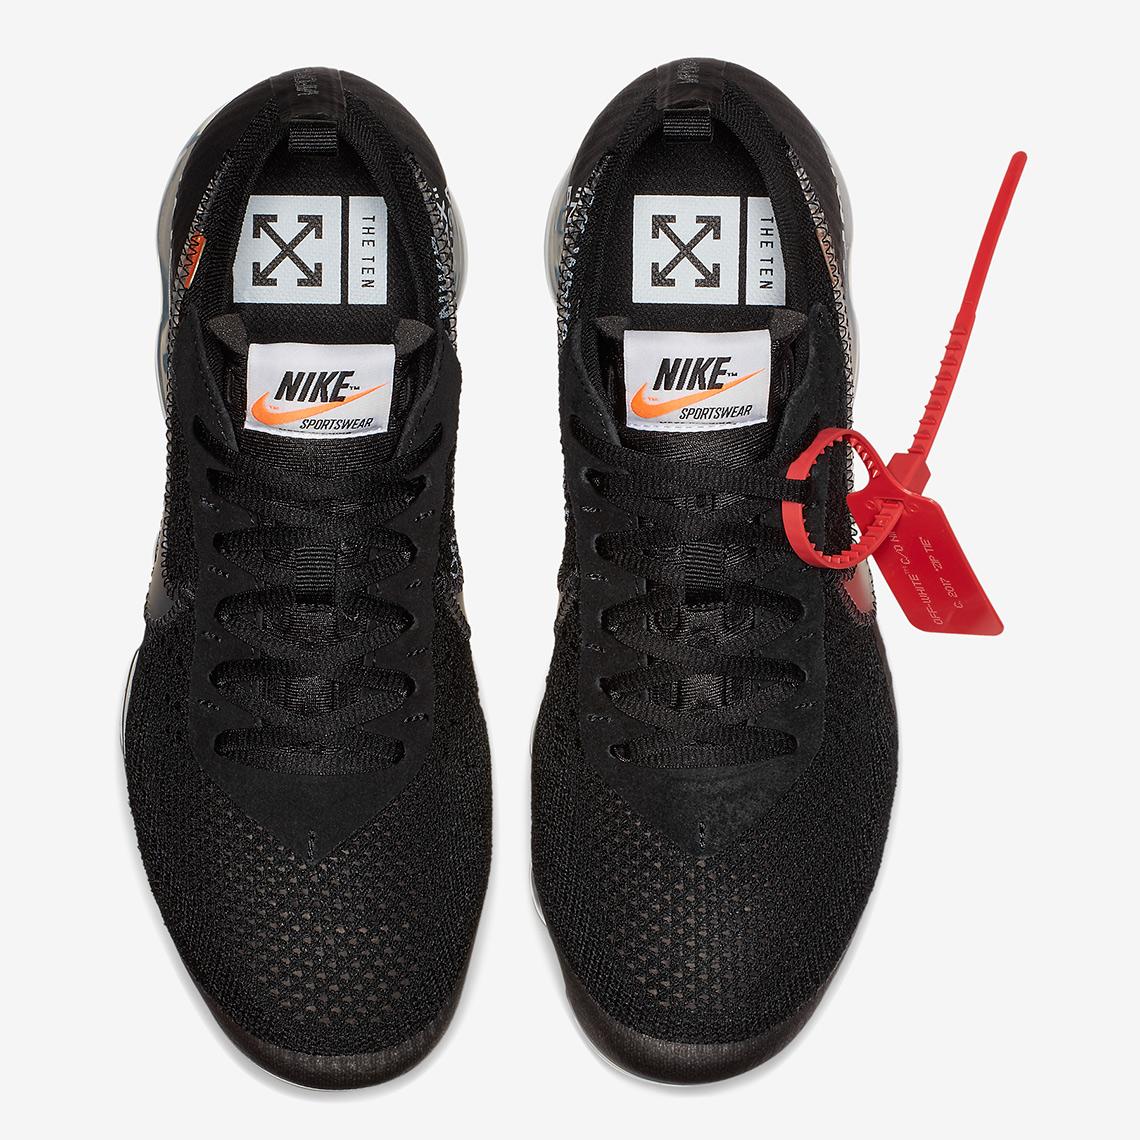 dec3f15cc22714 Where To Buy OFF WHITE x Nike Vapormax